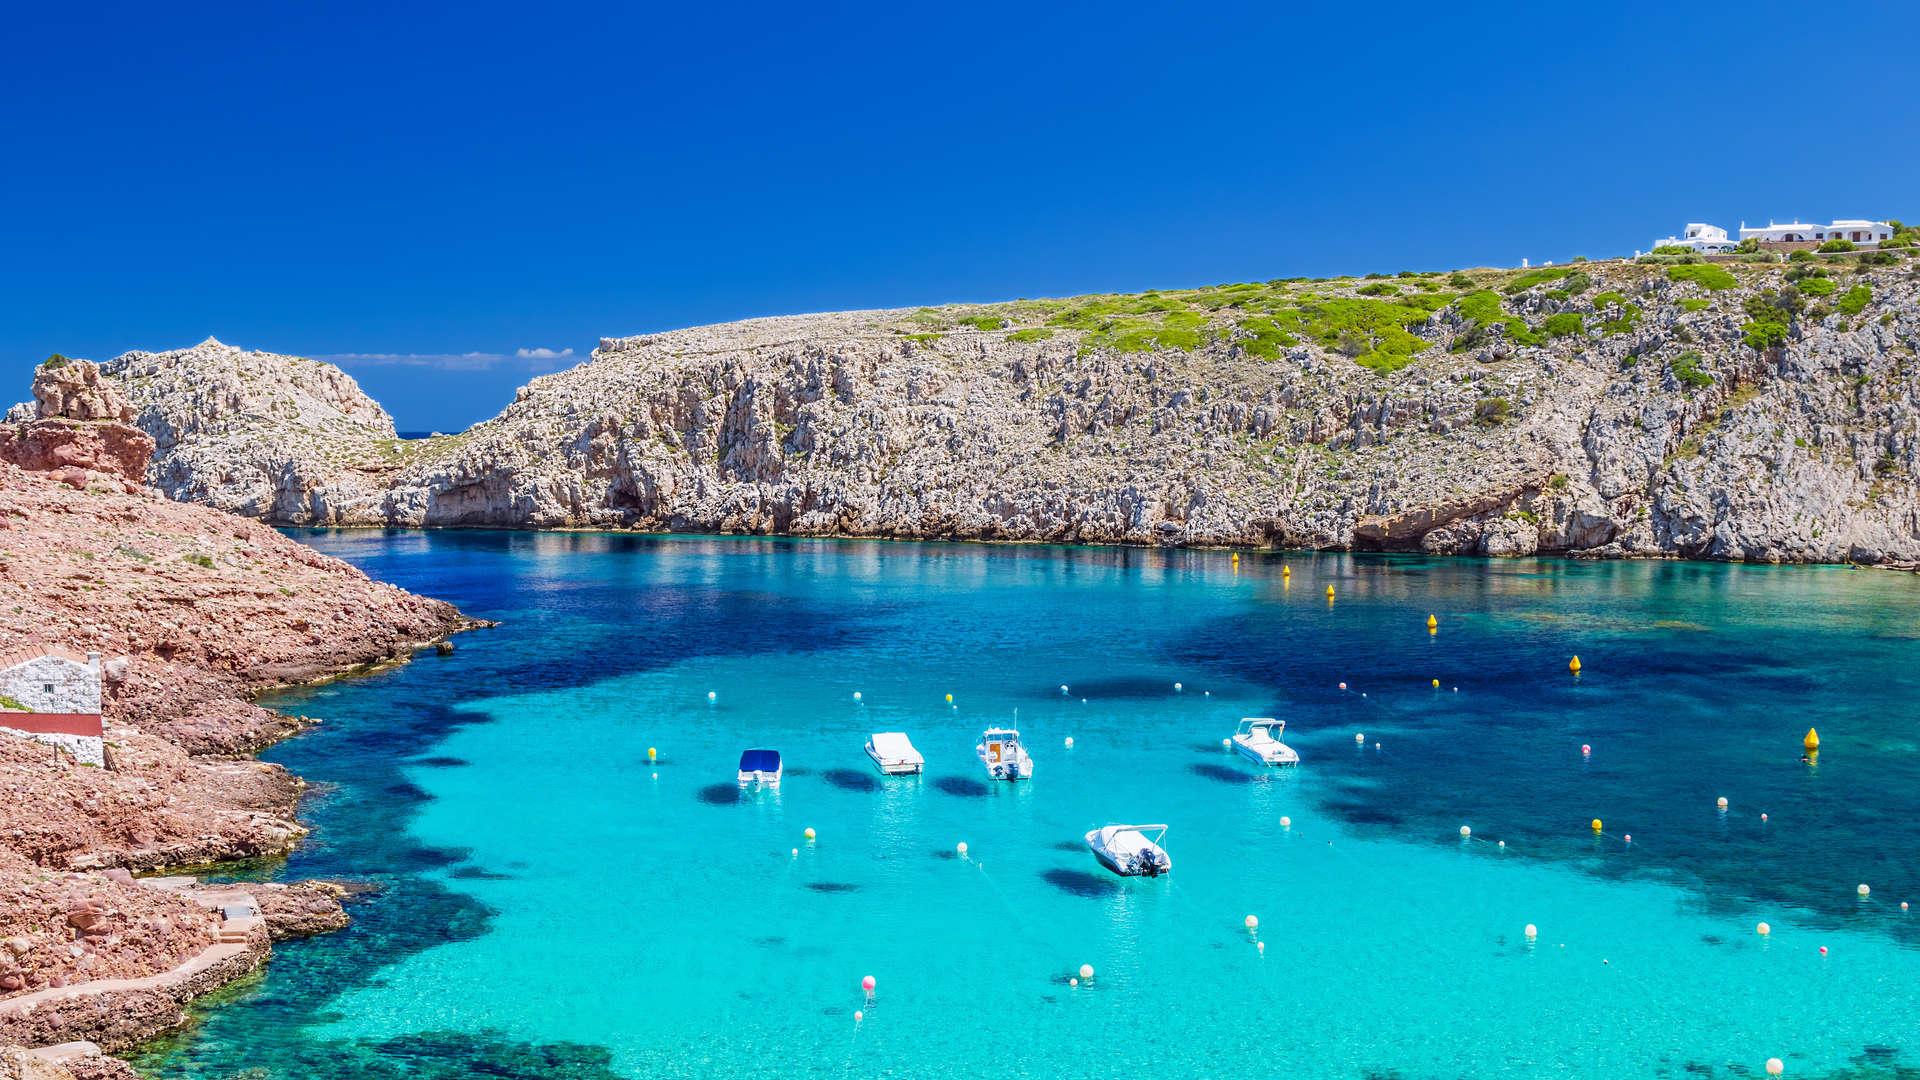 Spanien | Menorca | tuulijumala/Shutterstock.com